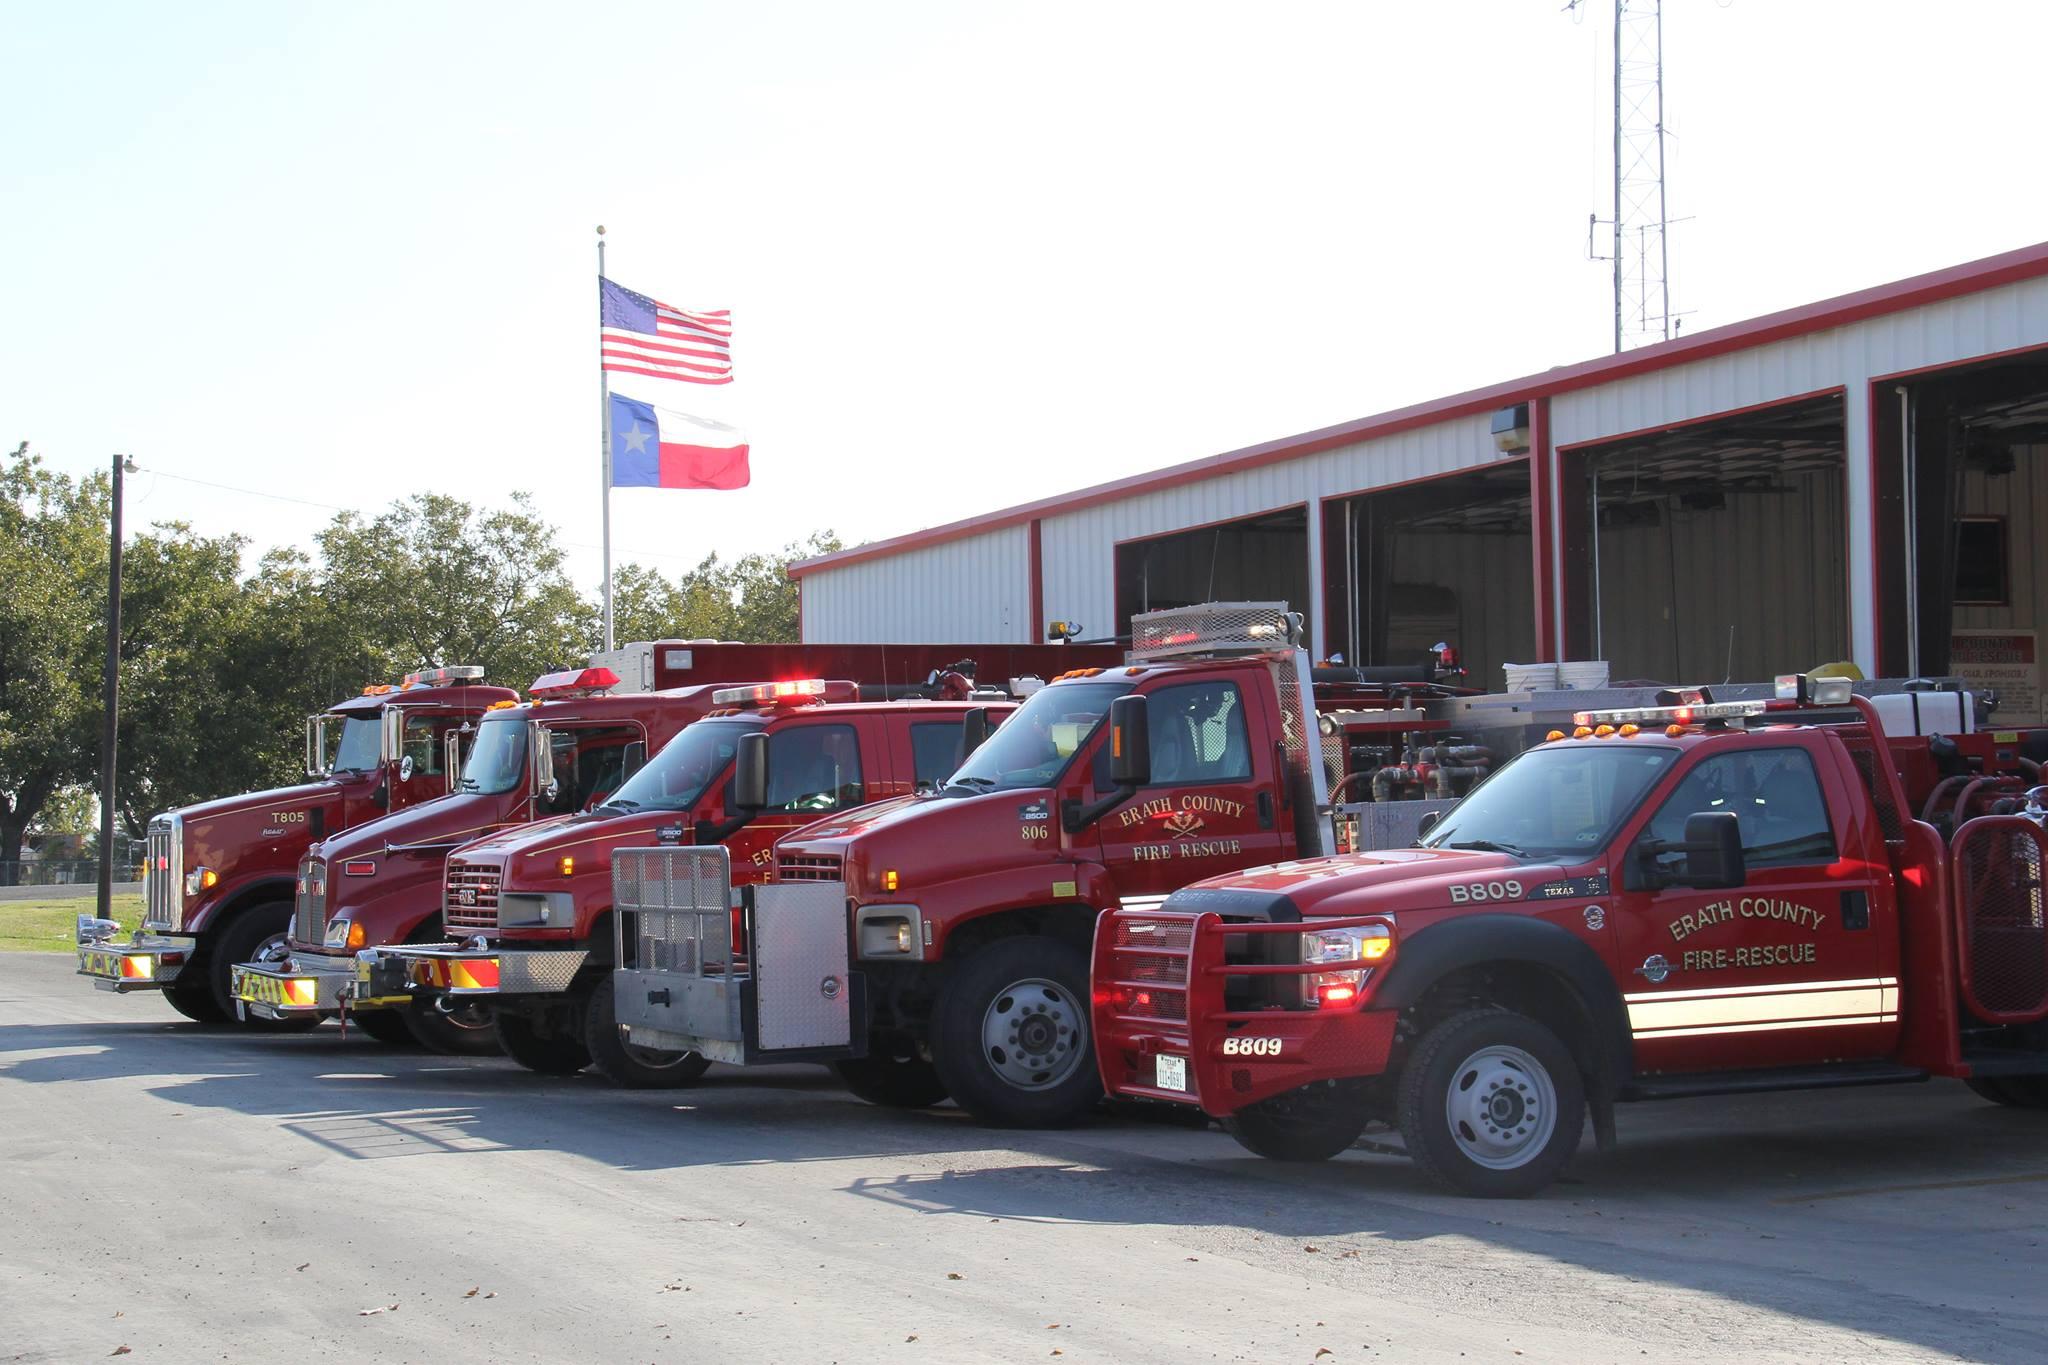 Erath County Volunteer Fire Rescue